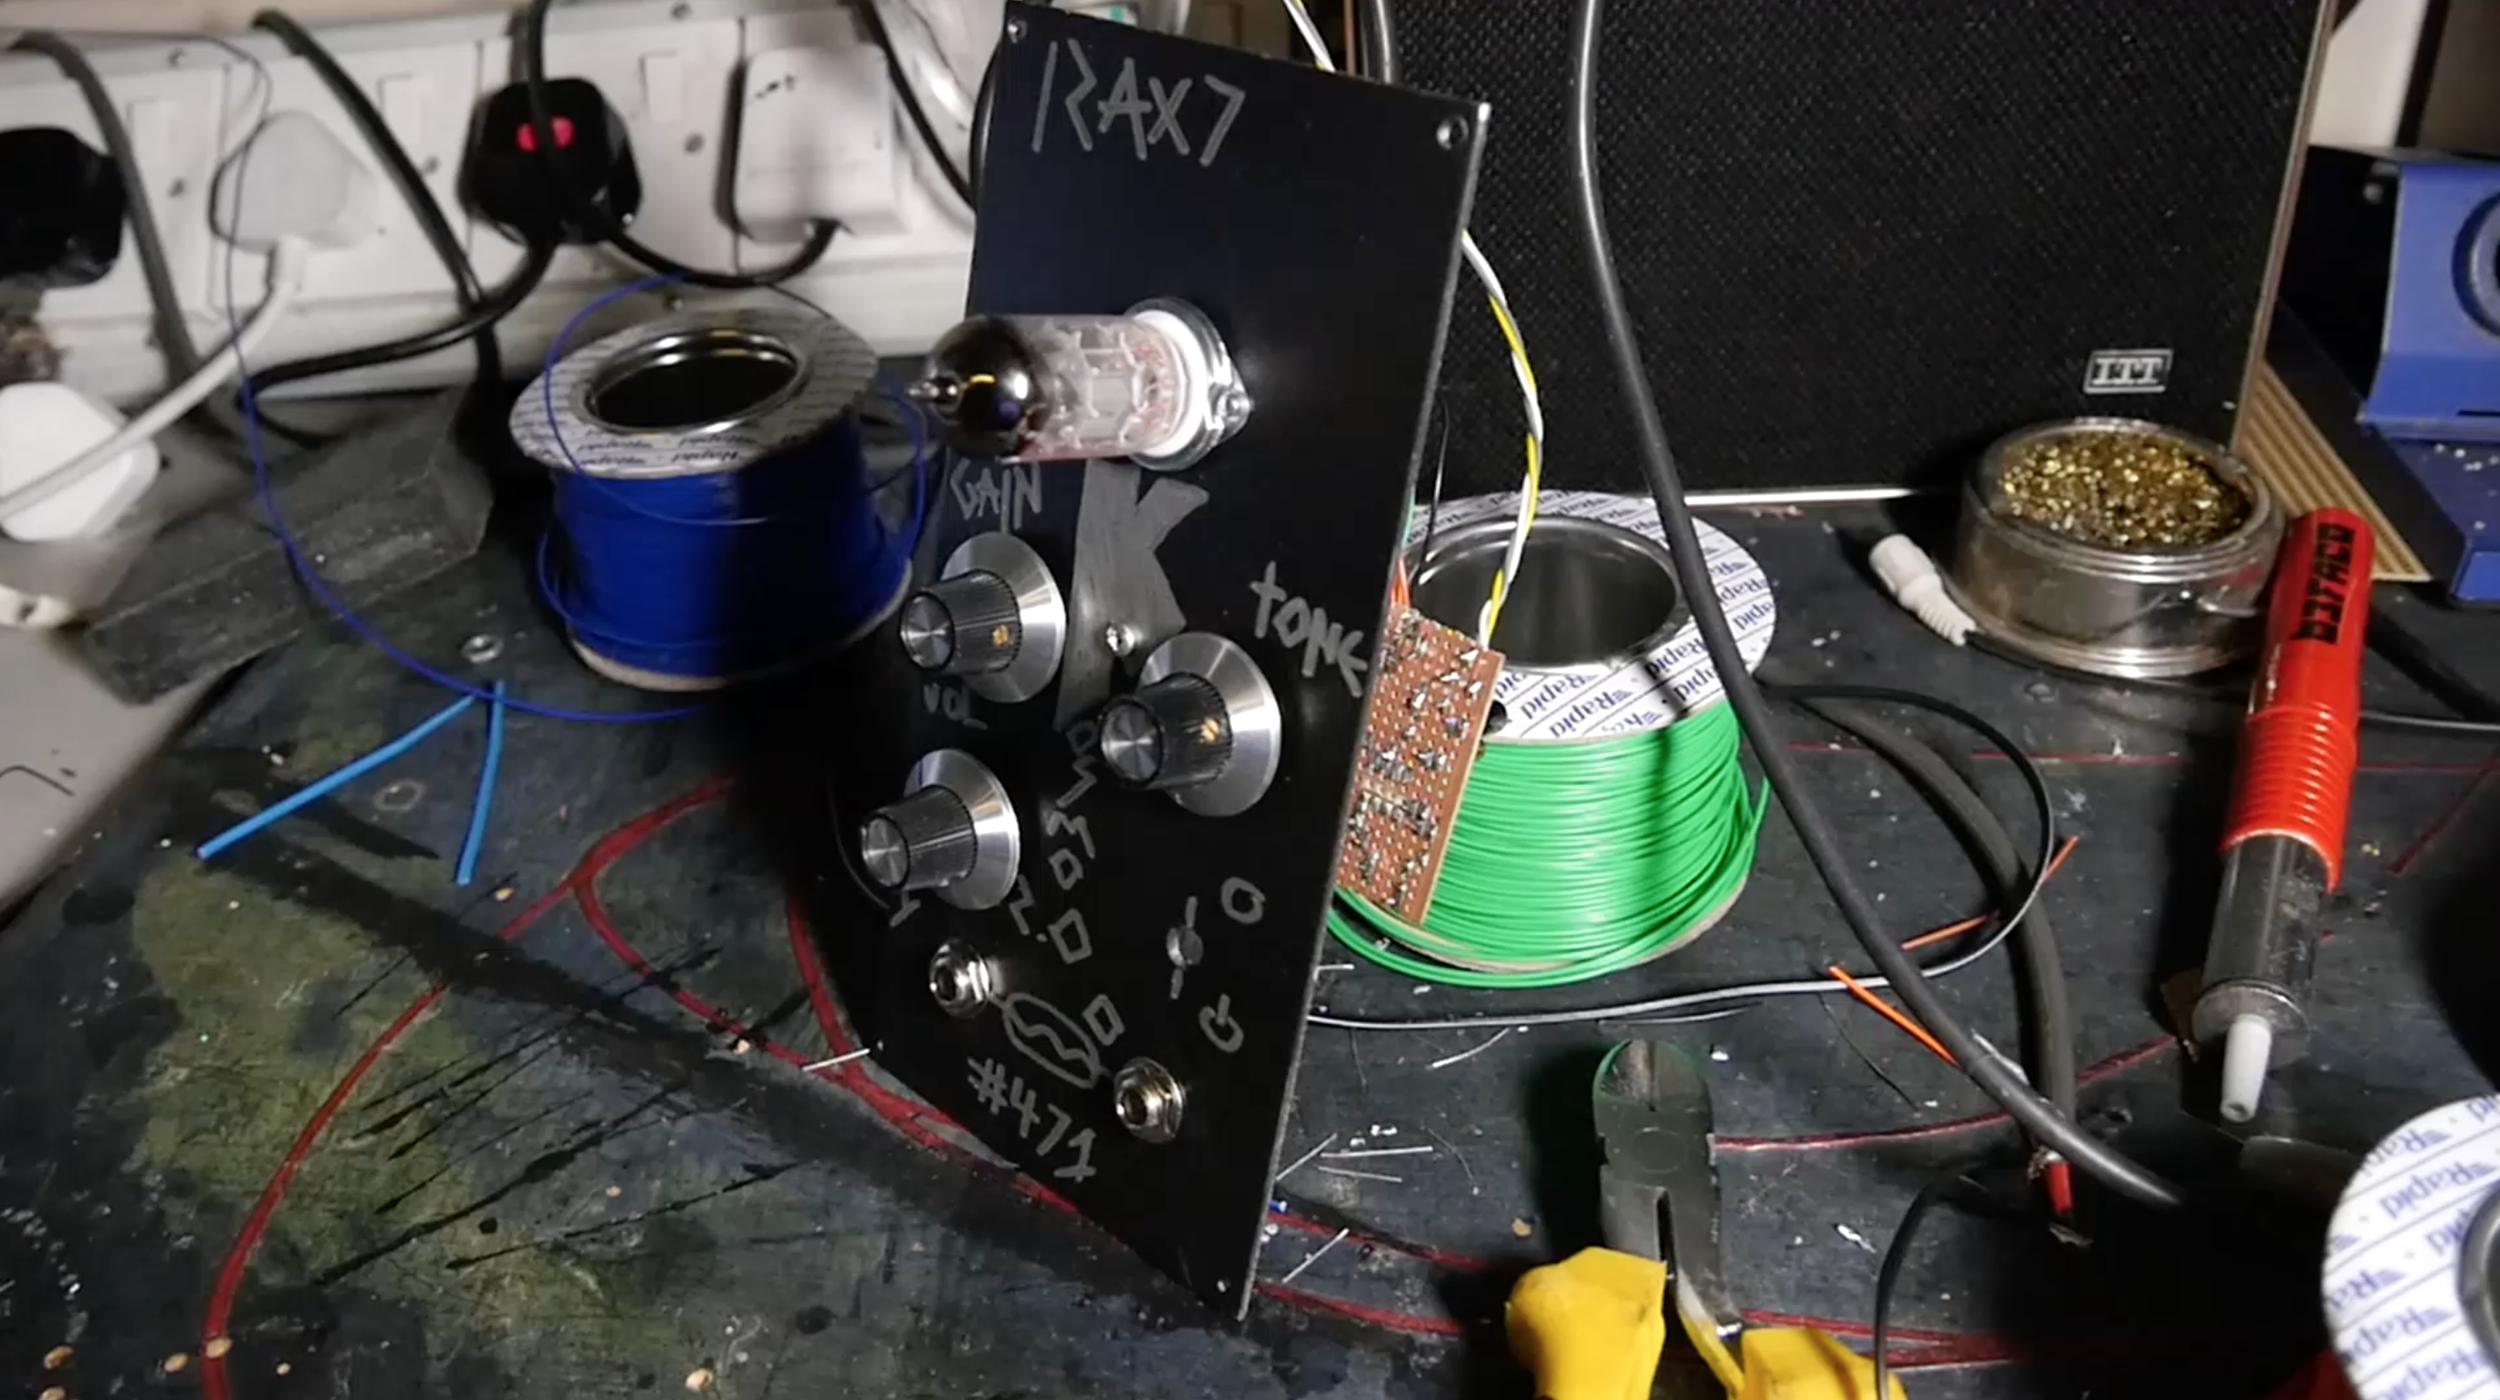 Valvecaster For Modular Synths